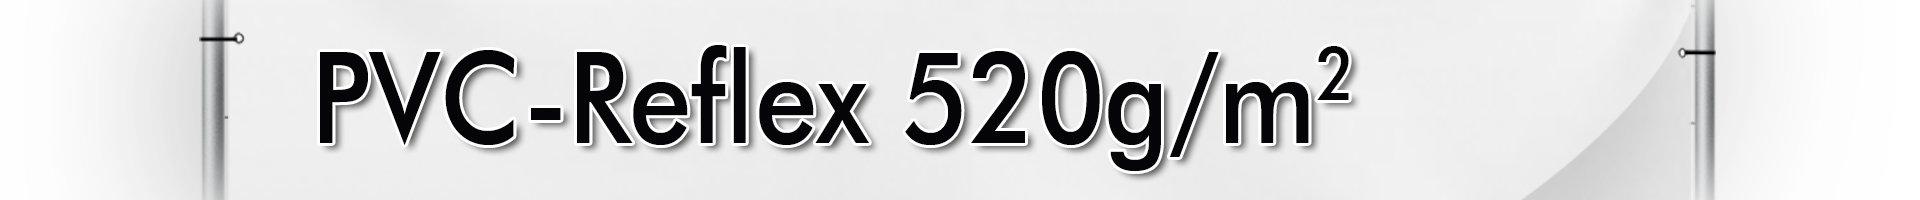 PVC-Reflex 520g/m²